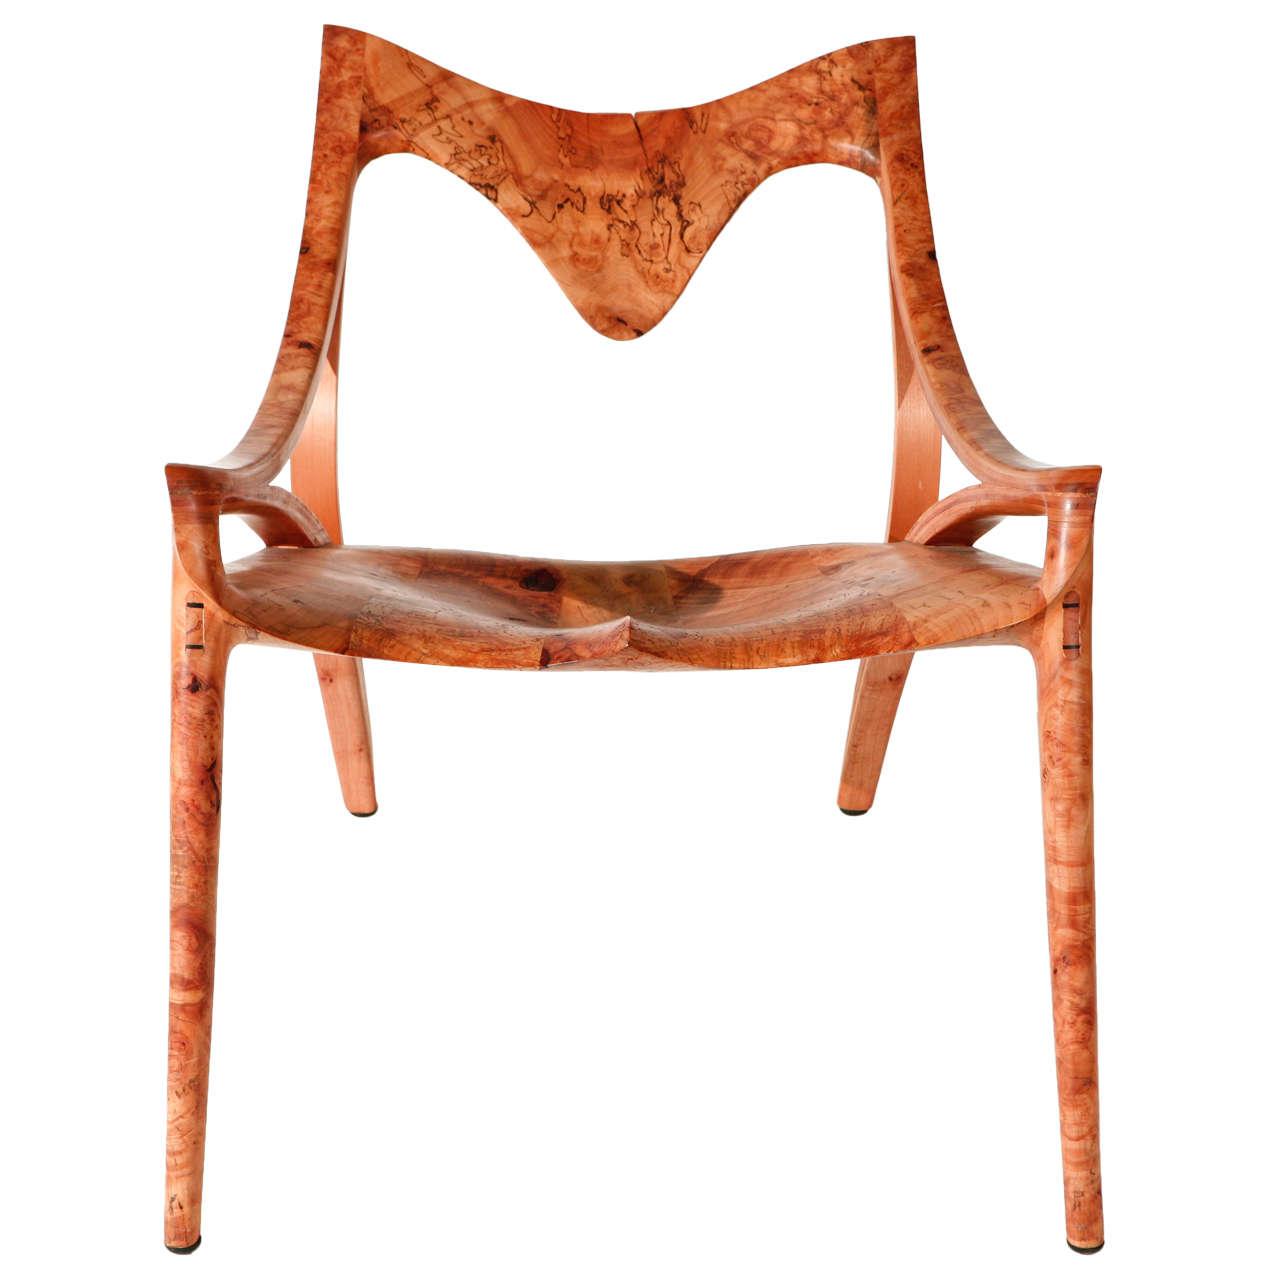 Michael Wilson 'Harley' Chair